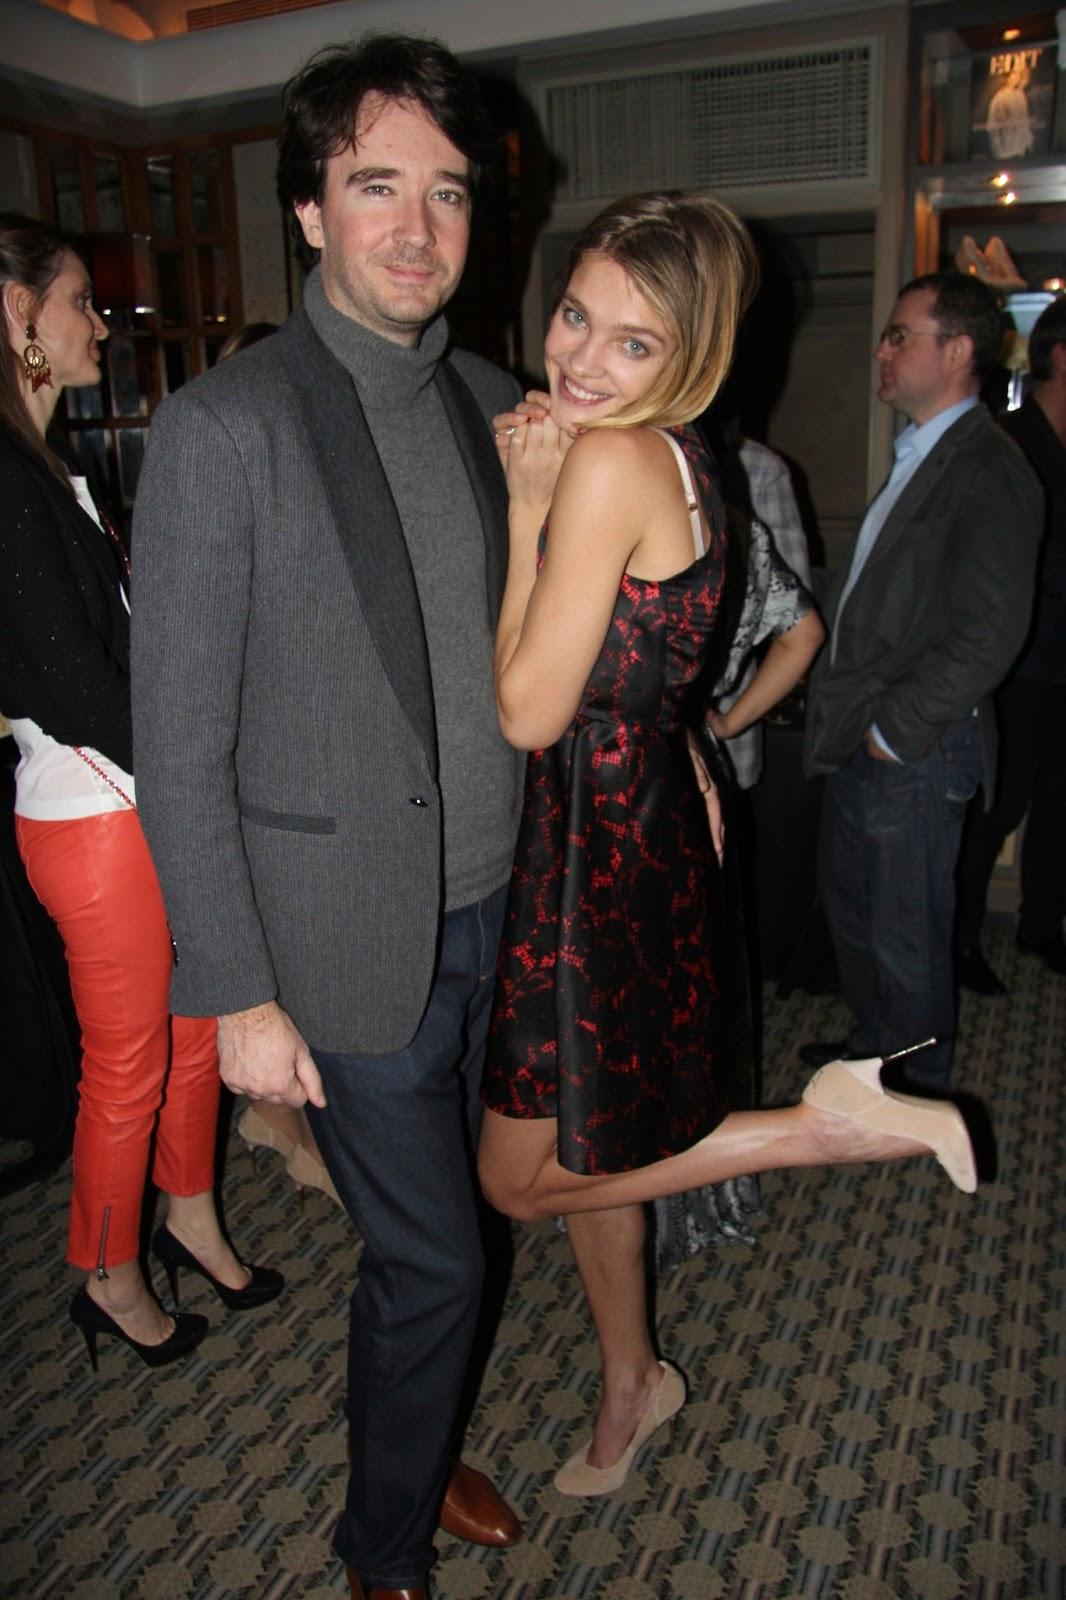 http://1.bp.blogspot.com/-h77pQT-XLlU/UTcgGQkGsrI/AAAAAAAAASw/_XsEofahqxw/s1600/Antoine+Arnault&Natalia+Vodianova.jpg